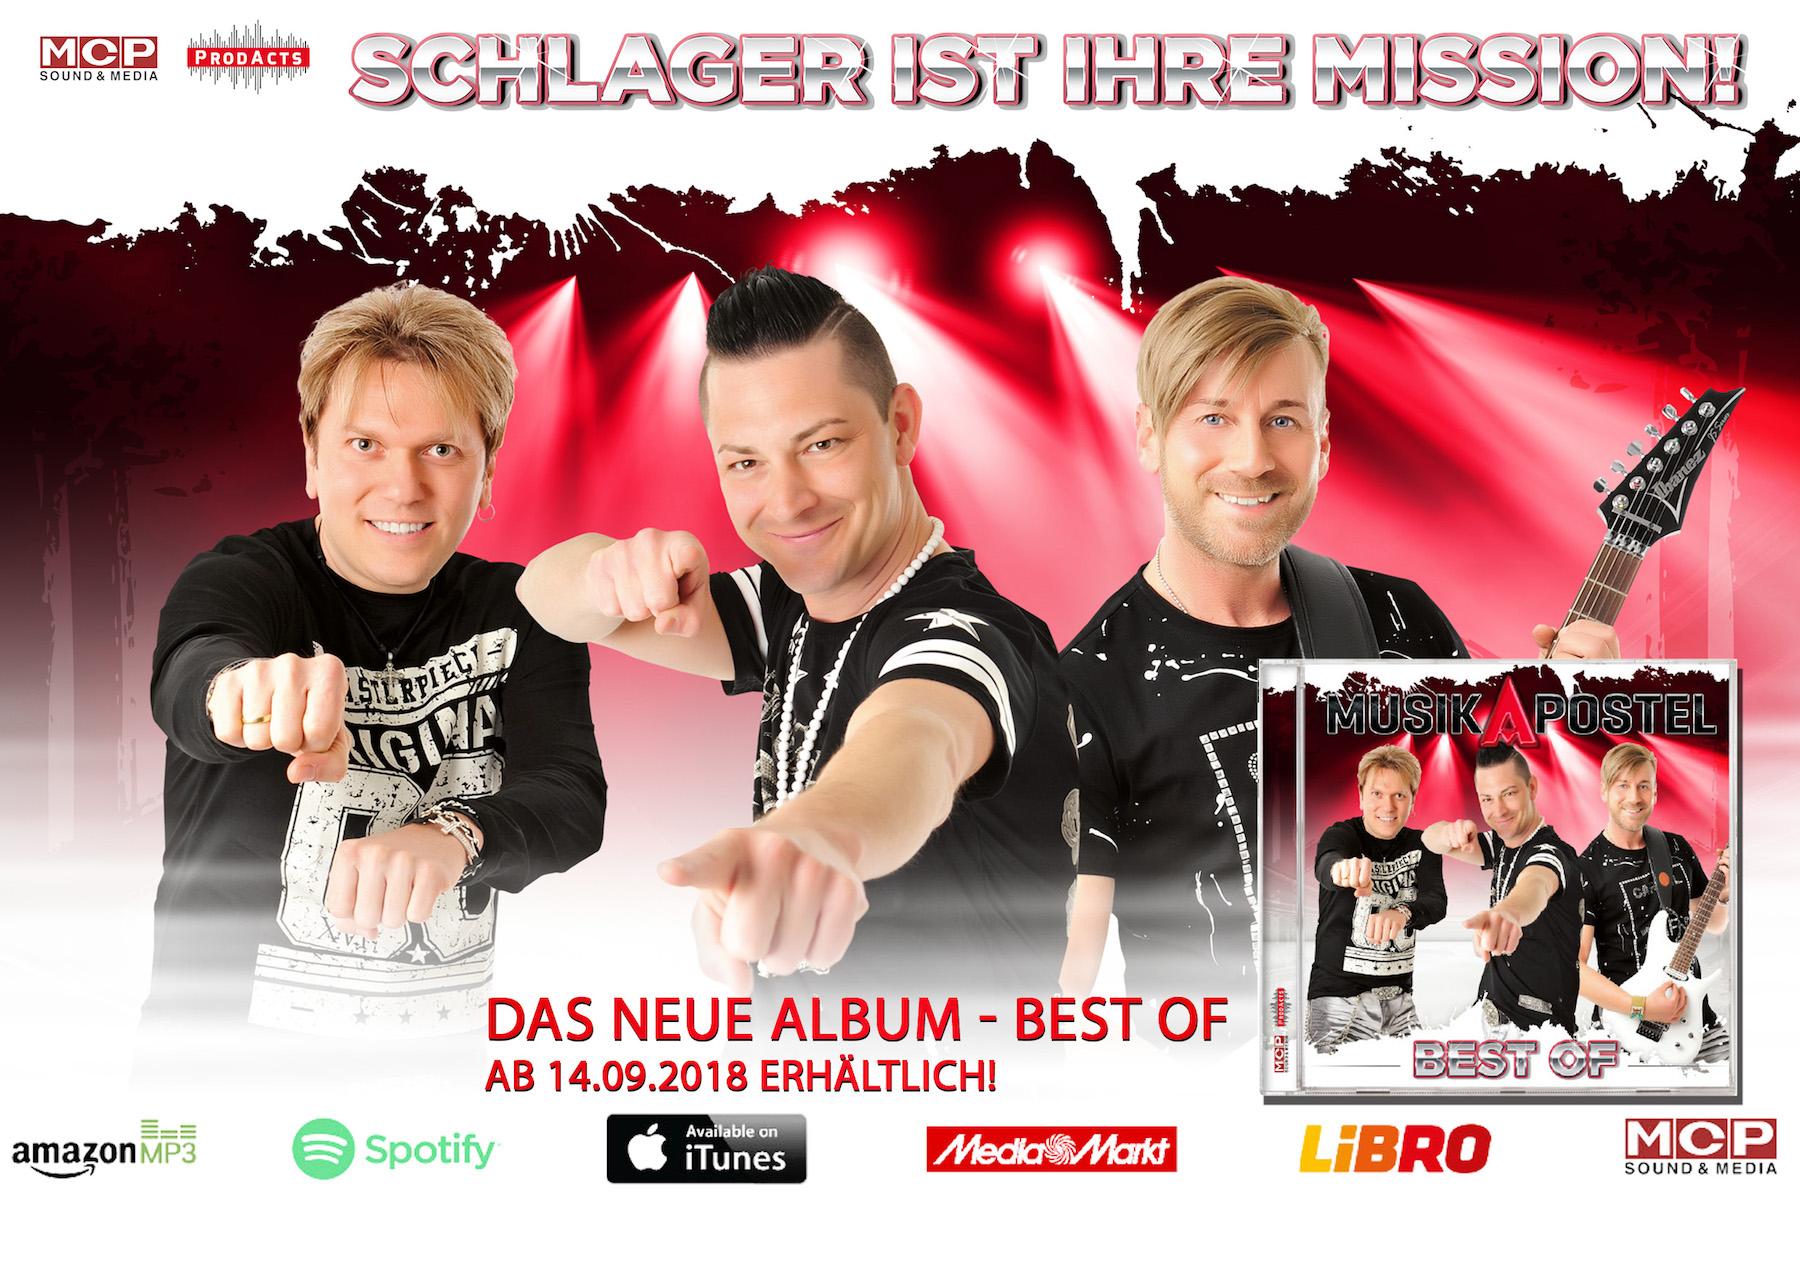 MusikApostel mainpage